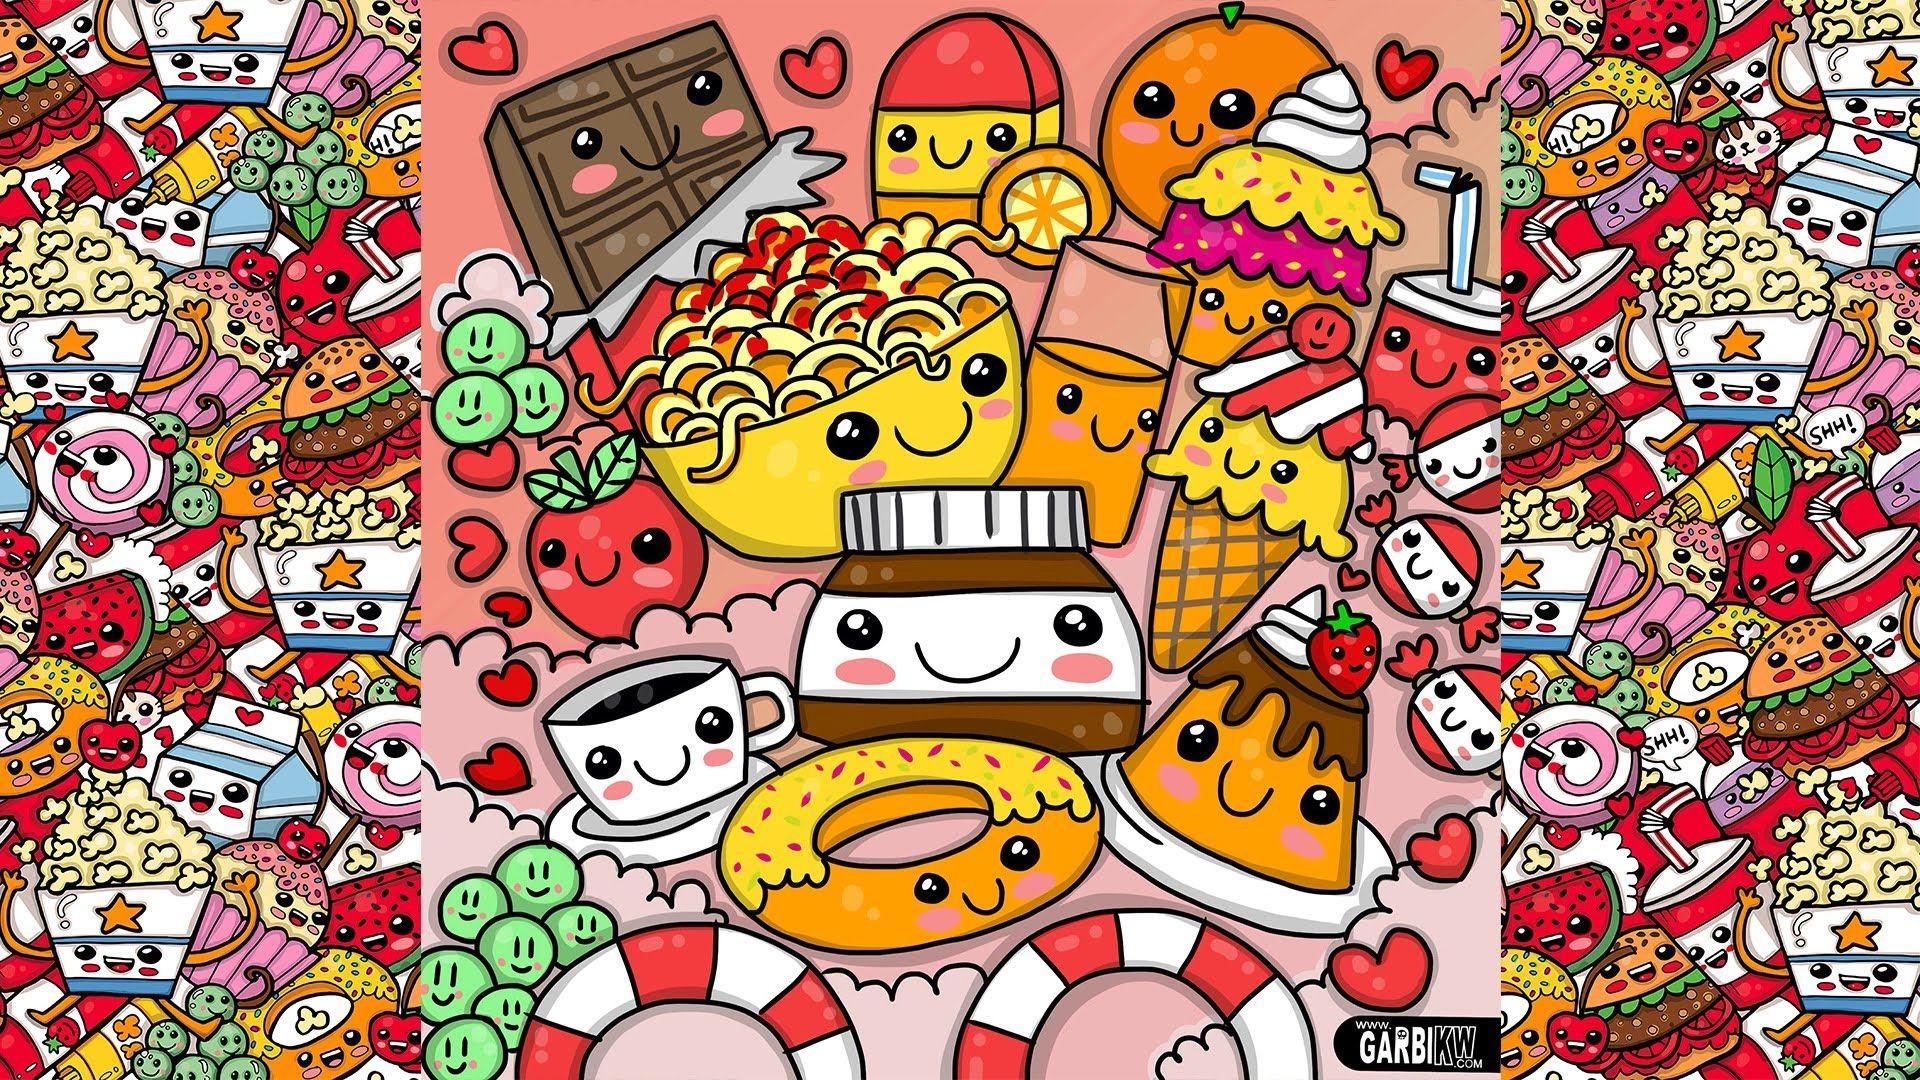 Cute Kawaii Food Wallpaper (57+ images)